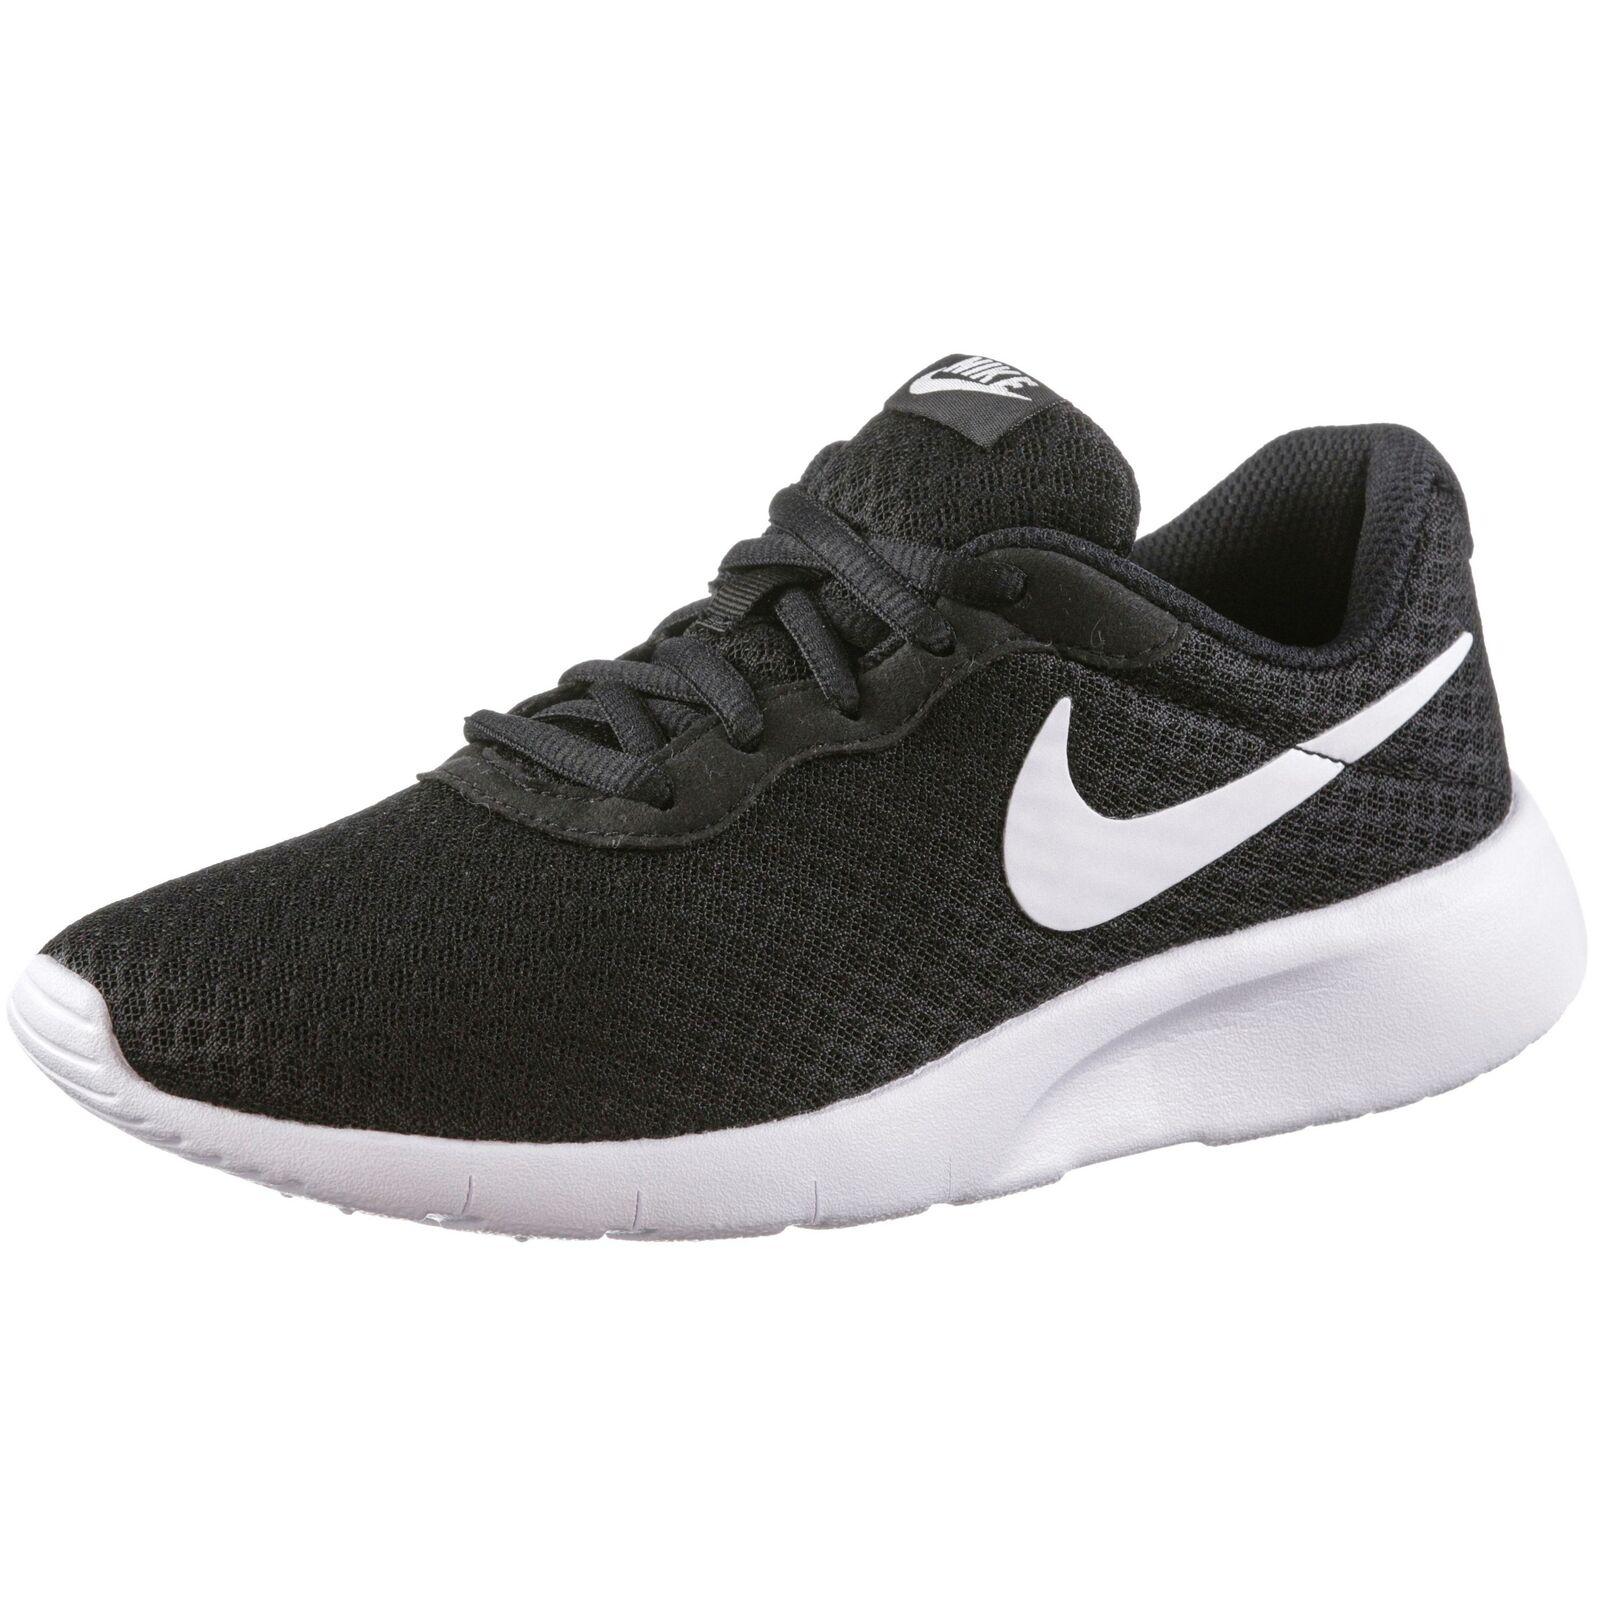 Nike Tanjun Kinder Laufschuhe SchwarzWeißWeiß, 39EU (818381 011)